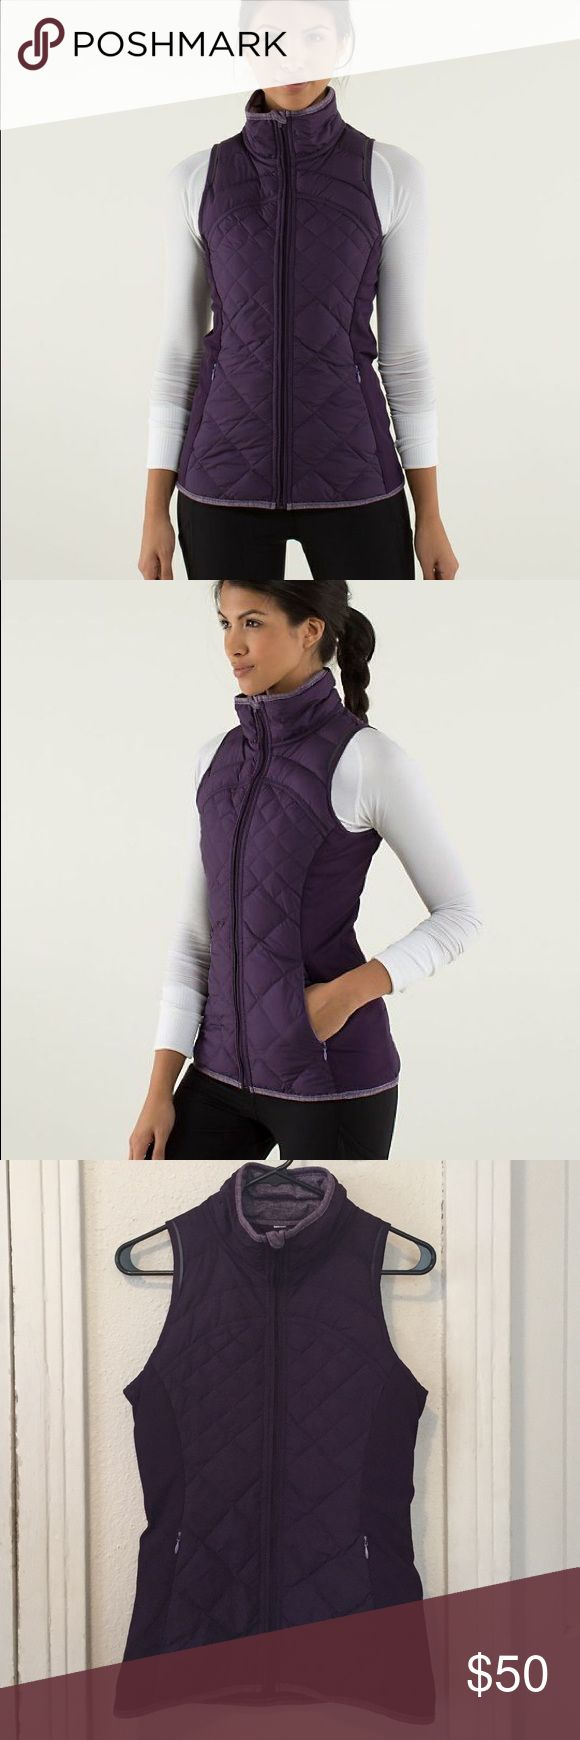 Lululemon fluff off vest Purple Lululemon vest in good conditions no rips or pilling. Size 6. lululemon athletica Jackets & Coats Vests